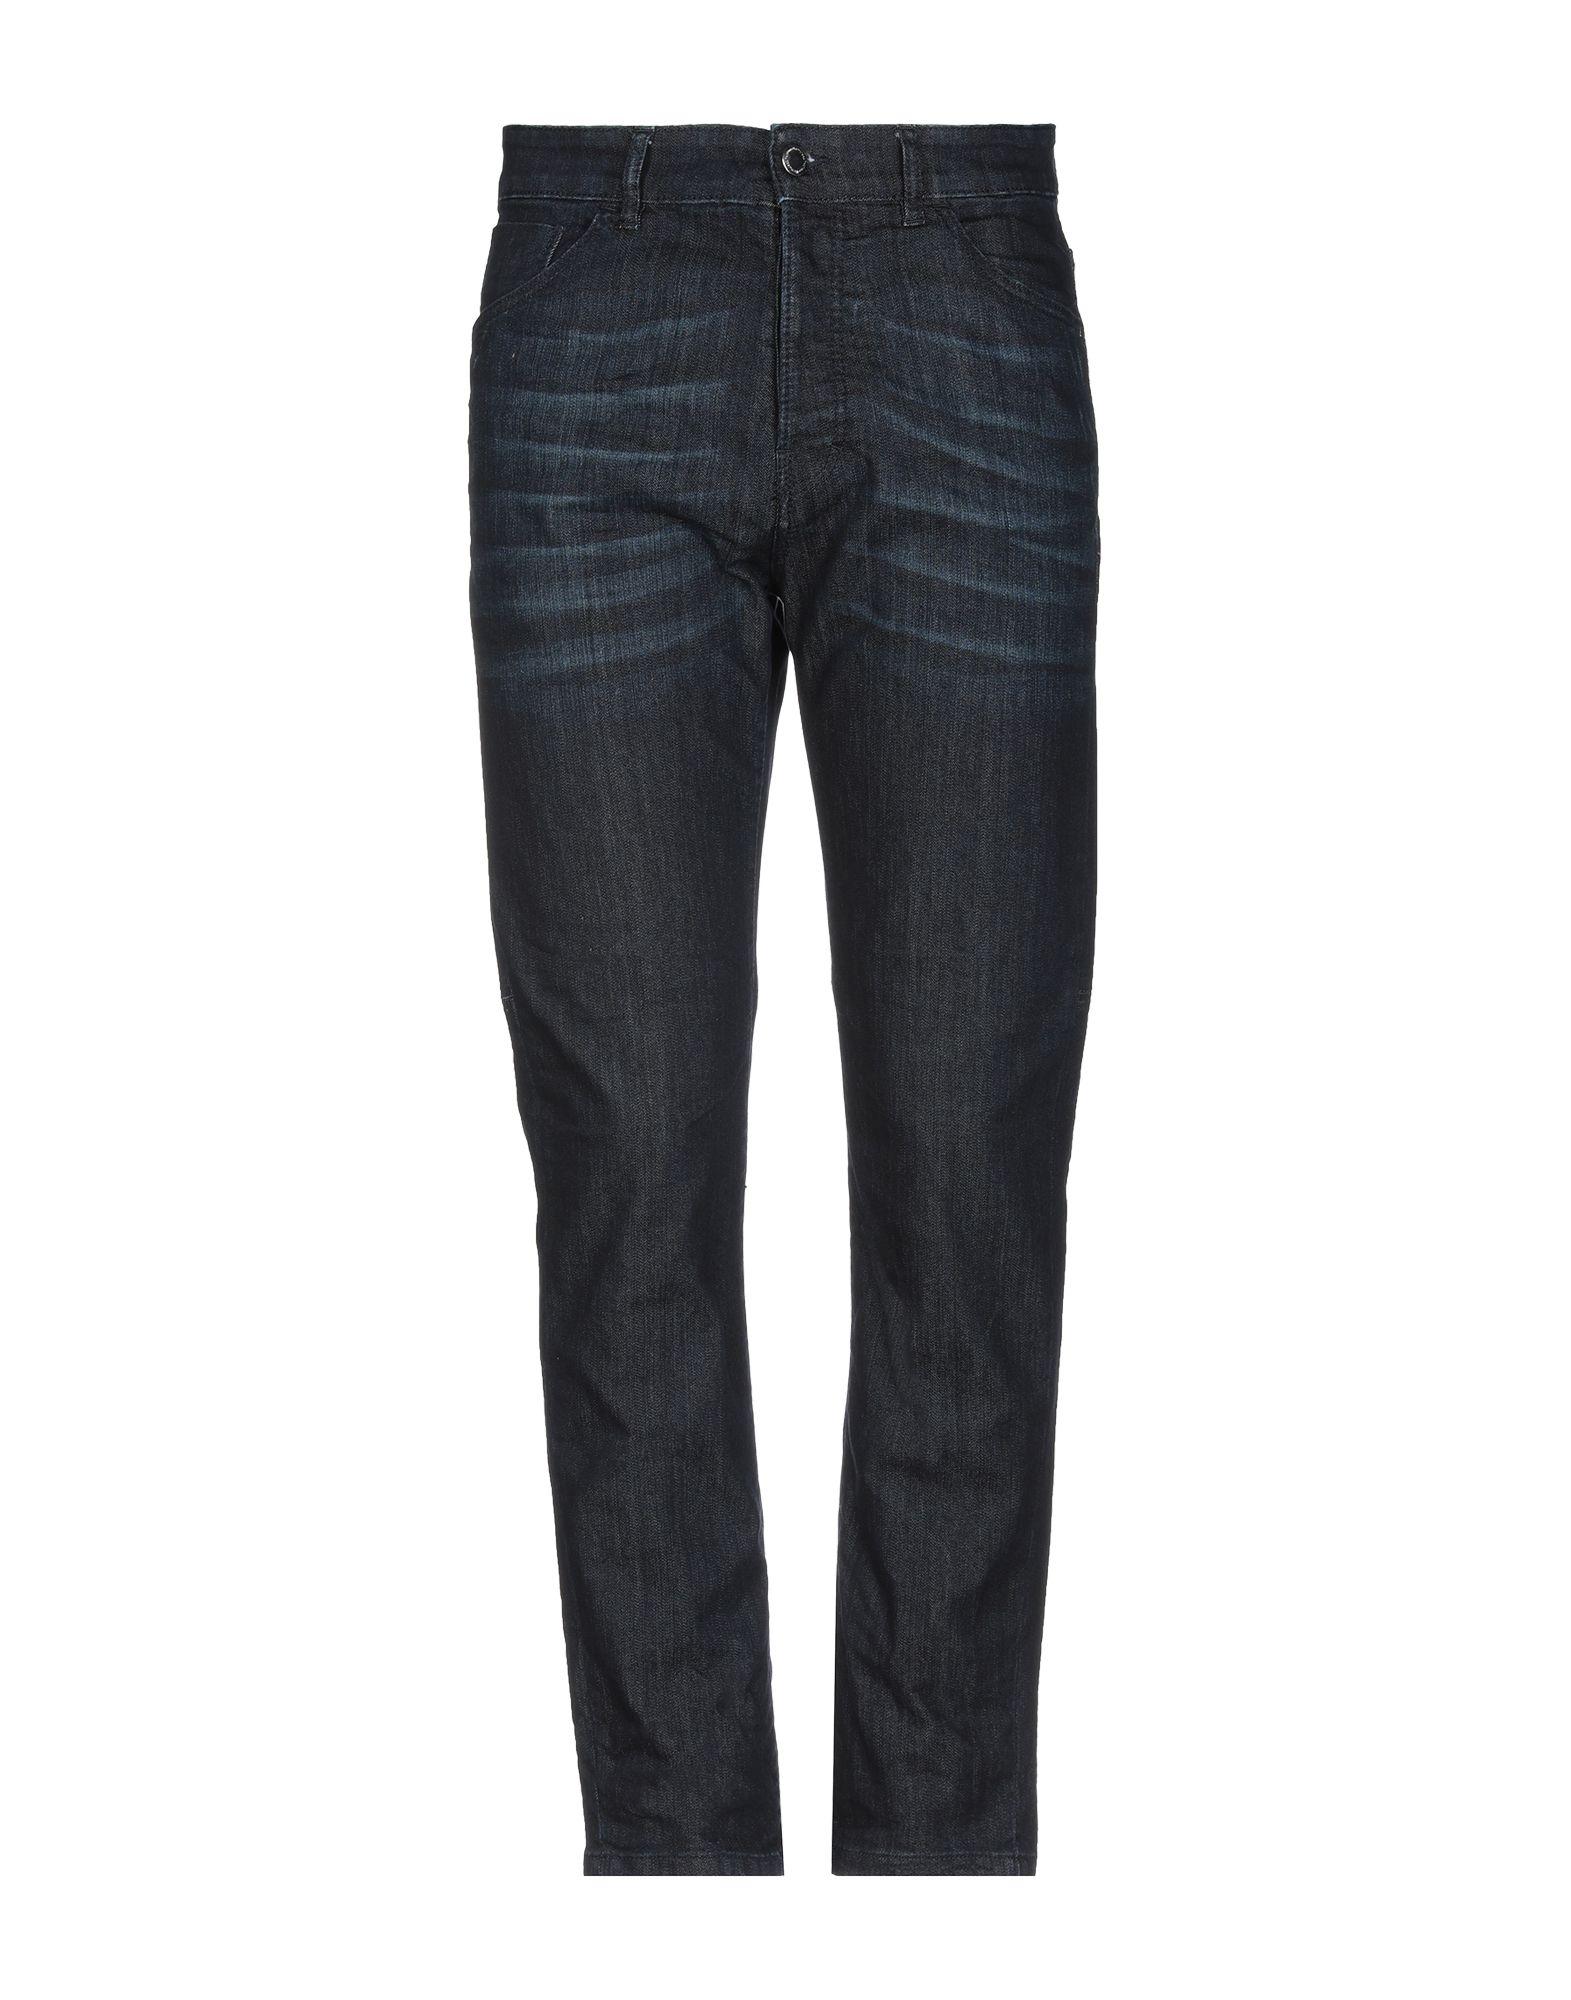 COSTUME NEMUTSO Джинсовые брюки